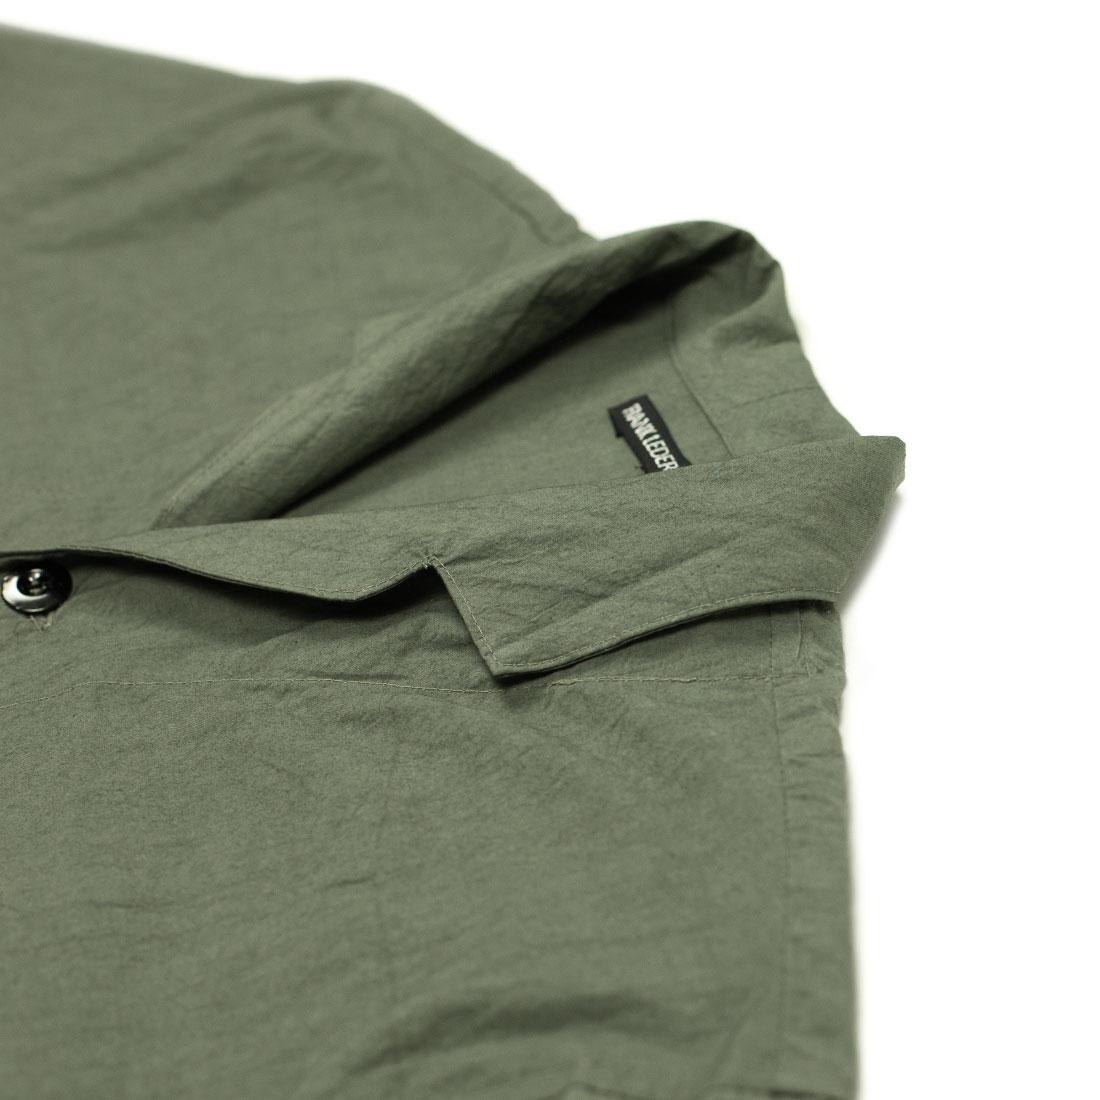 Frank Leder Spring Summer 2021 SS21 Made in Germany lightweight camp shirt (2).jpg